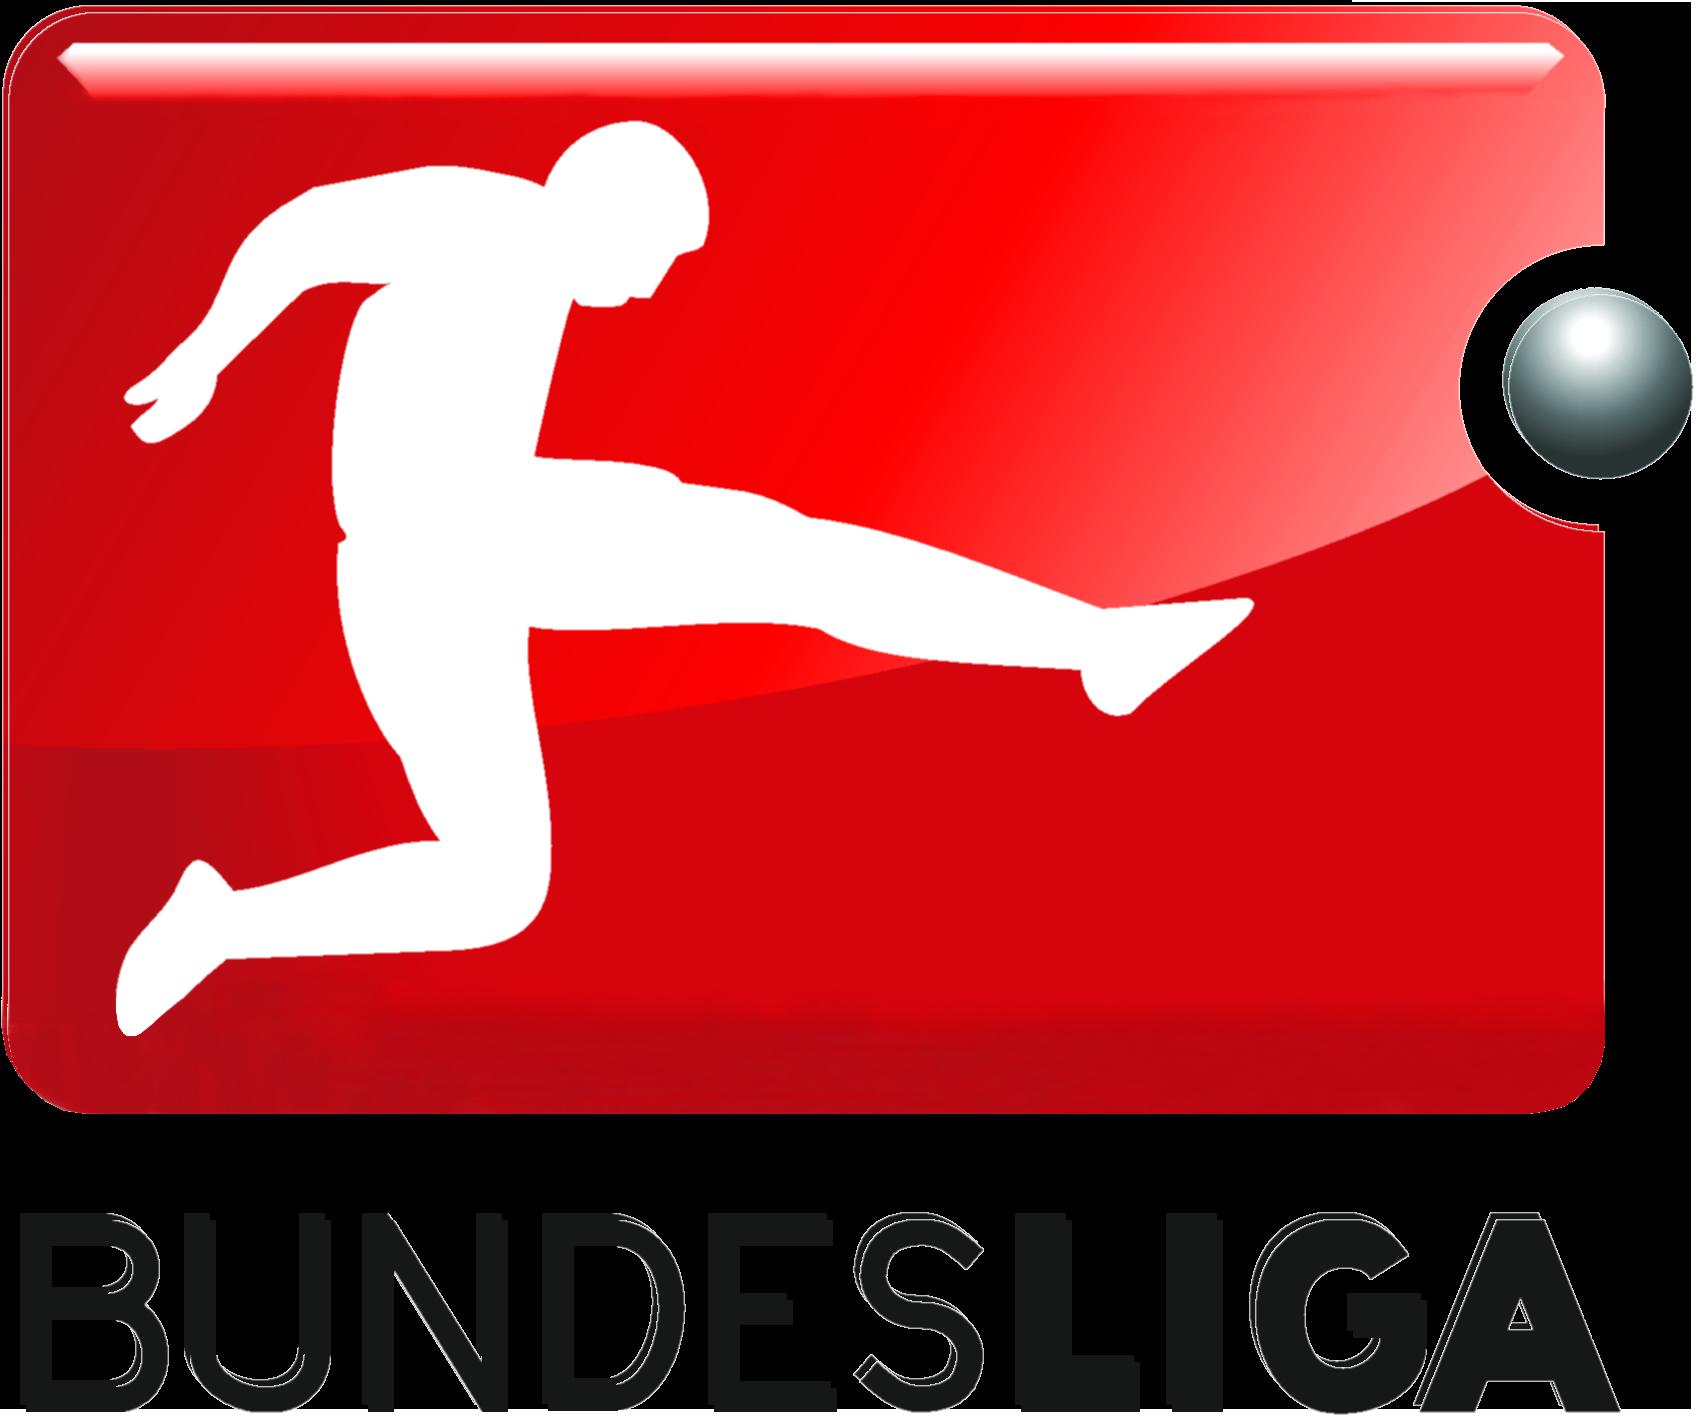 The German League = BundesLiga. Germany always produces ...